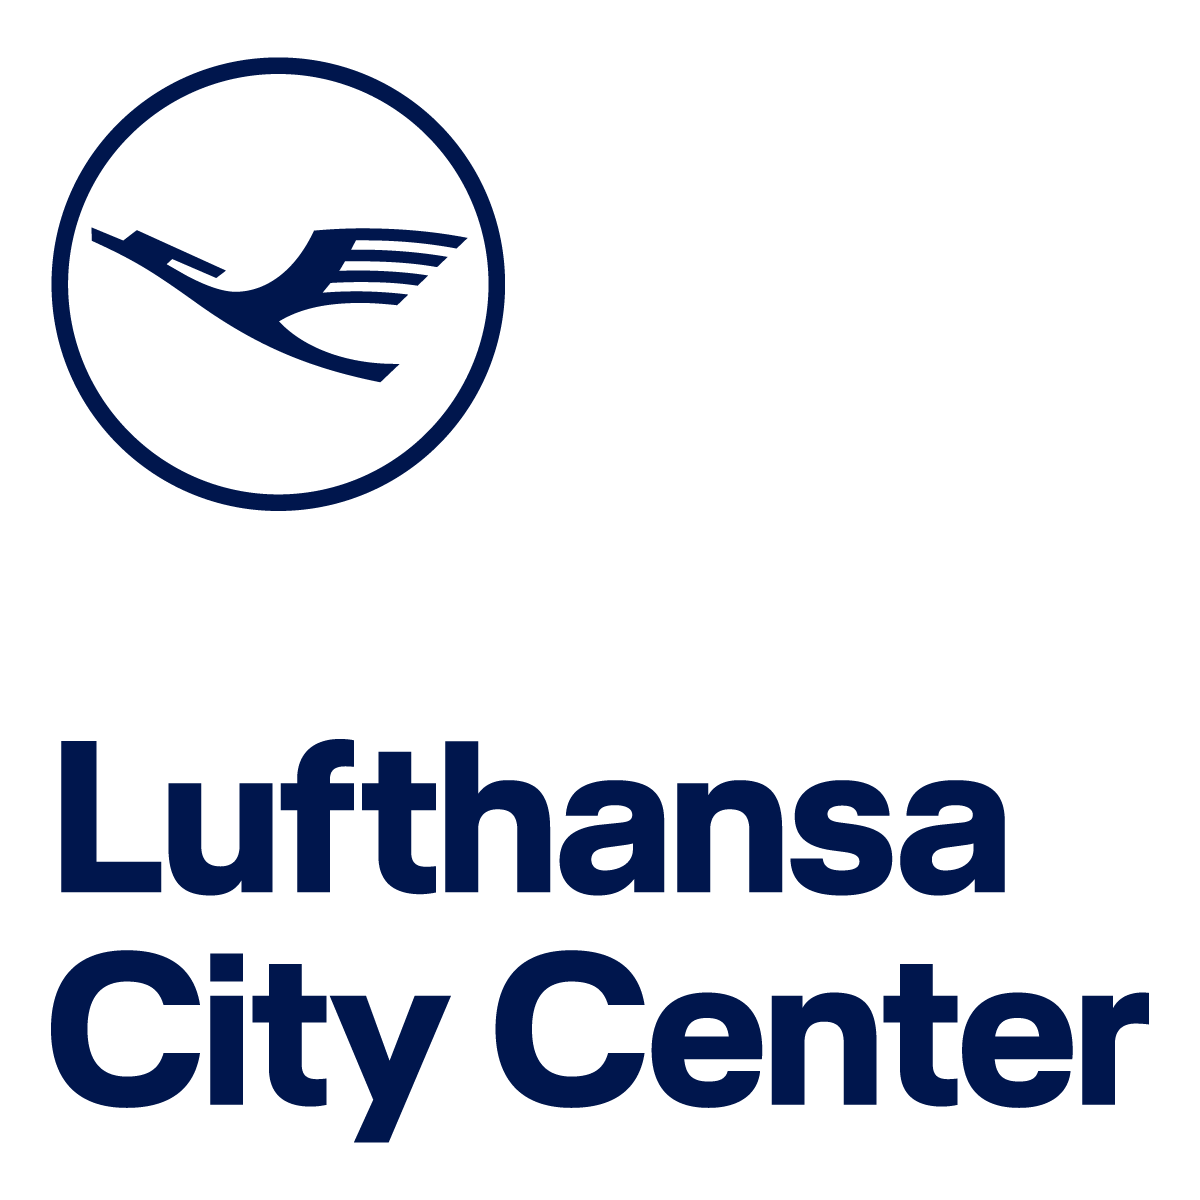 Linzgau Reisebüro GmbH Lufthansa City Center